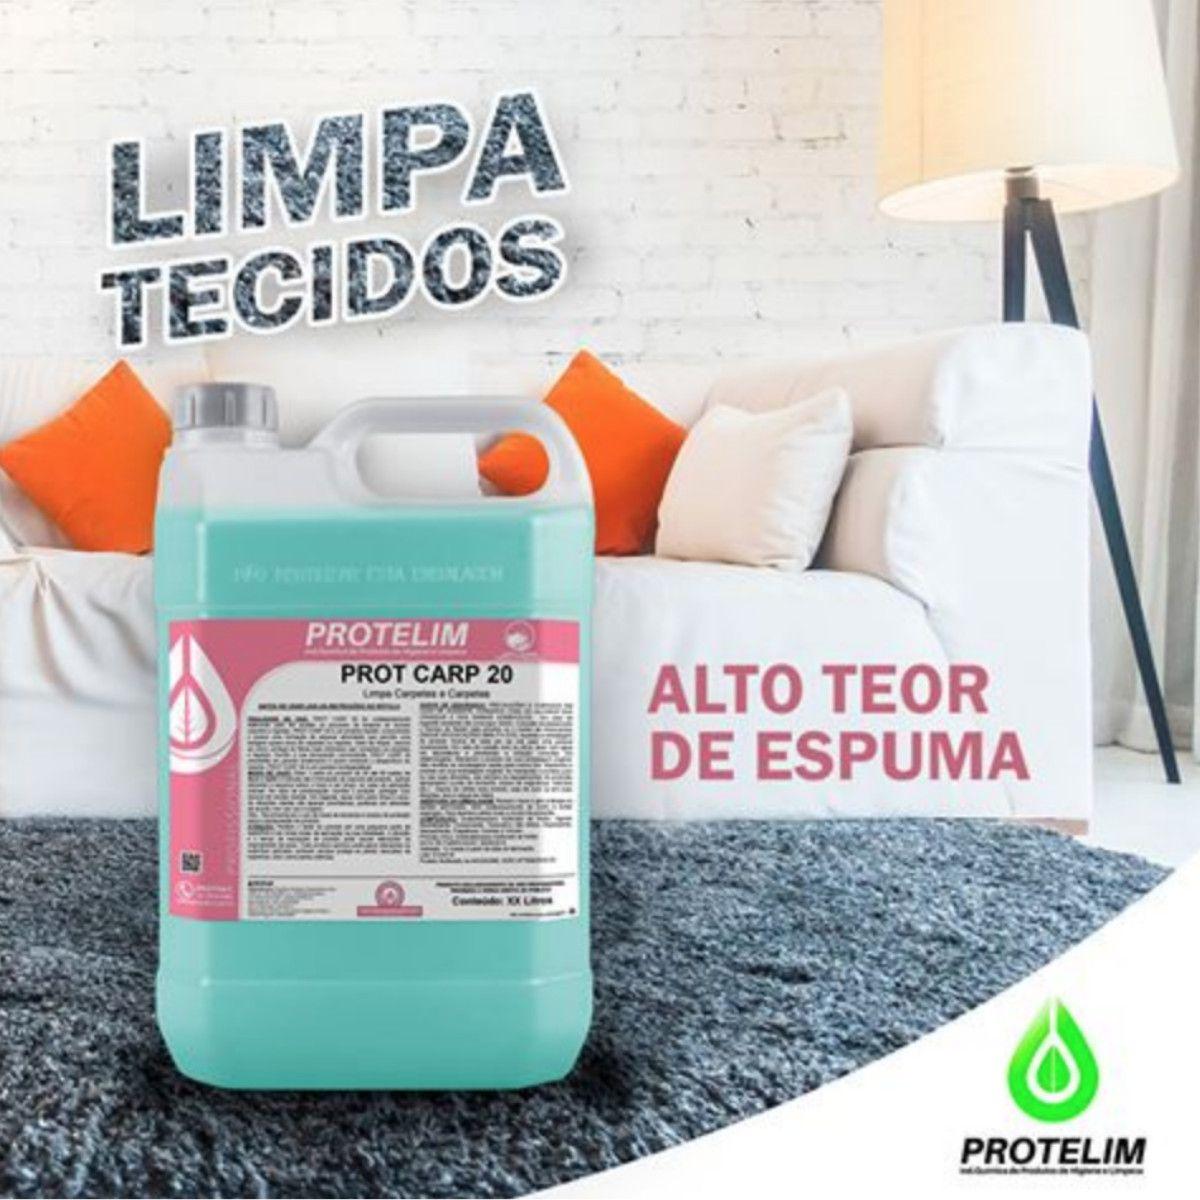 Limpa Carpete E Estofados Prot Carp-20 Protelim 5 Litros